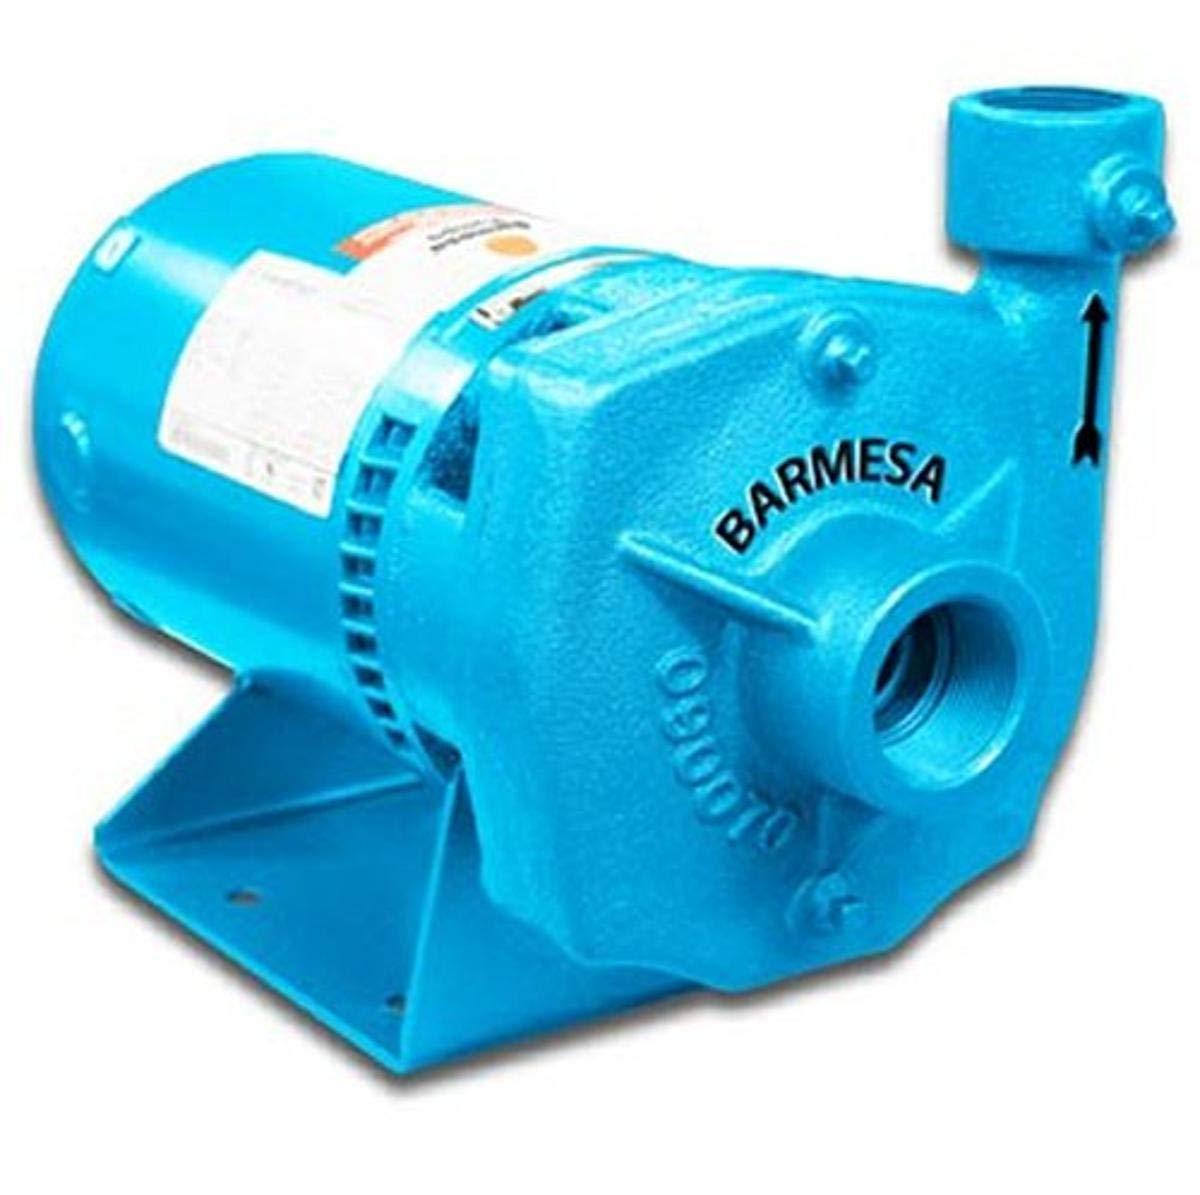 Barmesa Pumps 62071506 End Suction Japan Maker New Coupled Mesa Mall Centrifugal Close Pum